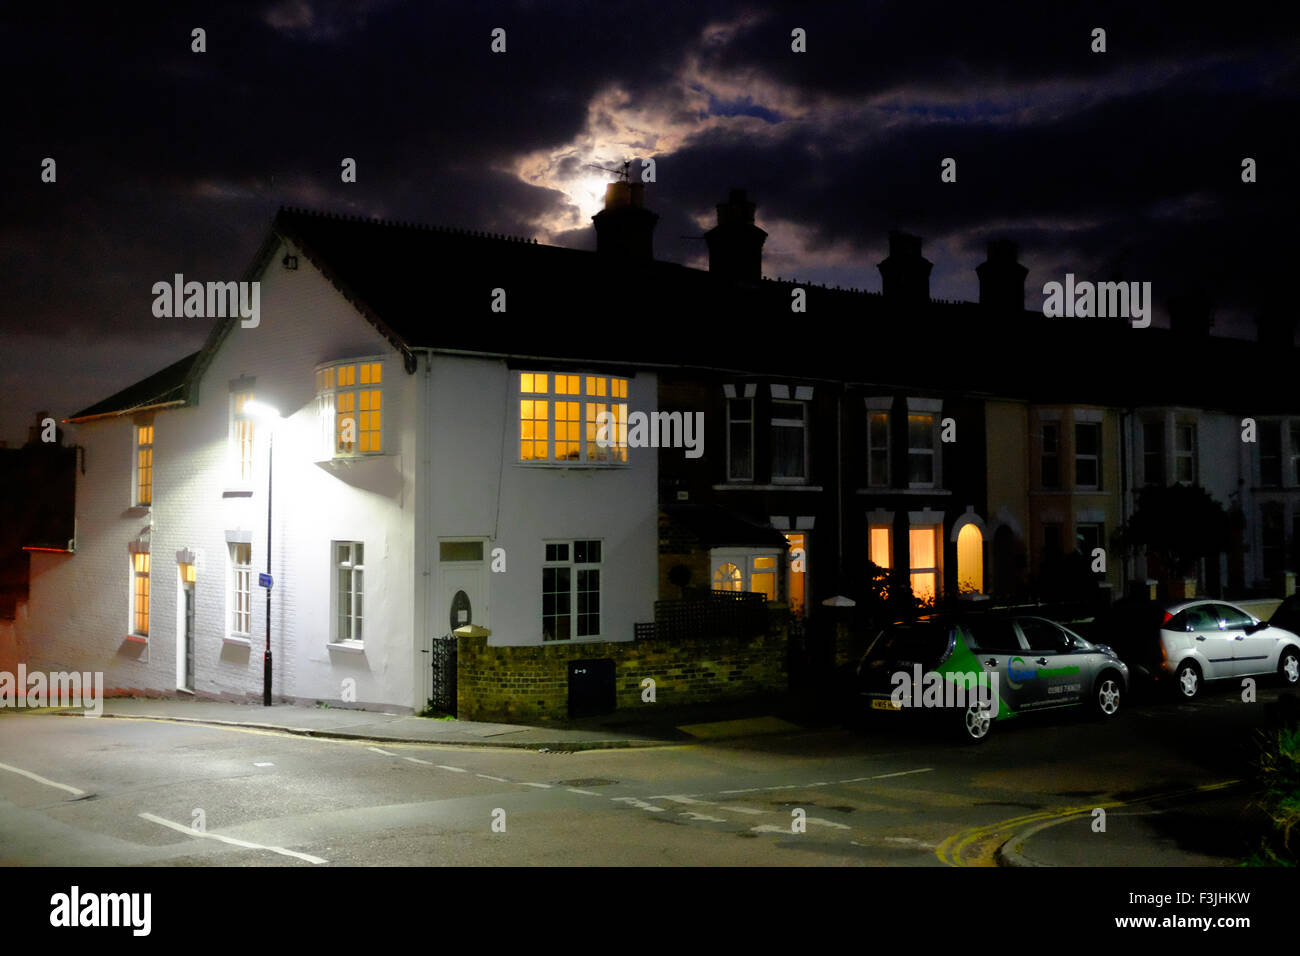 moonrise moon rise night scene houses terrace street lights lighting chimneys windows lit at corner cars parked - Stock Image